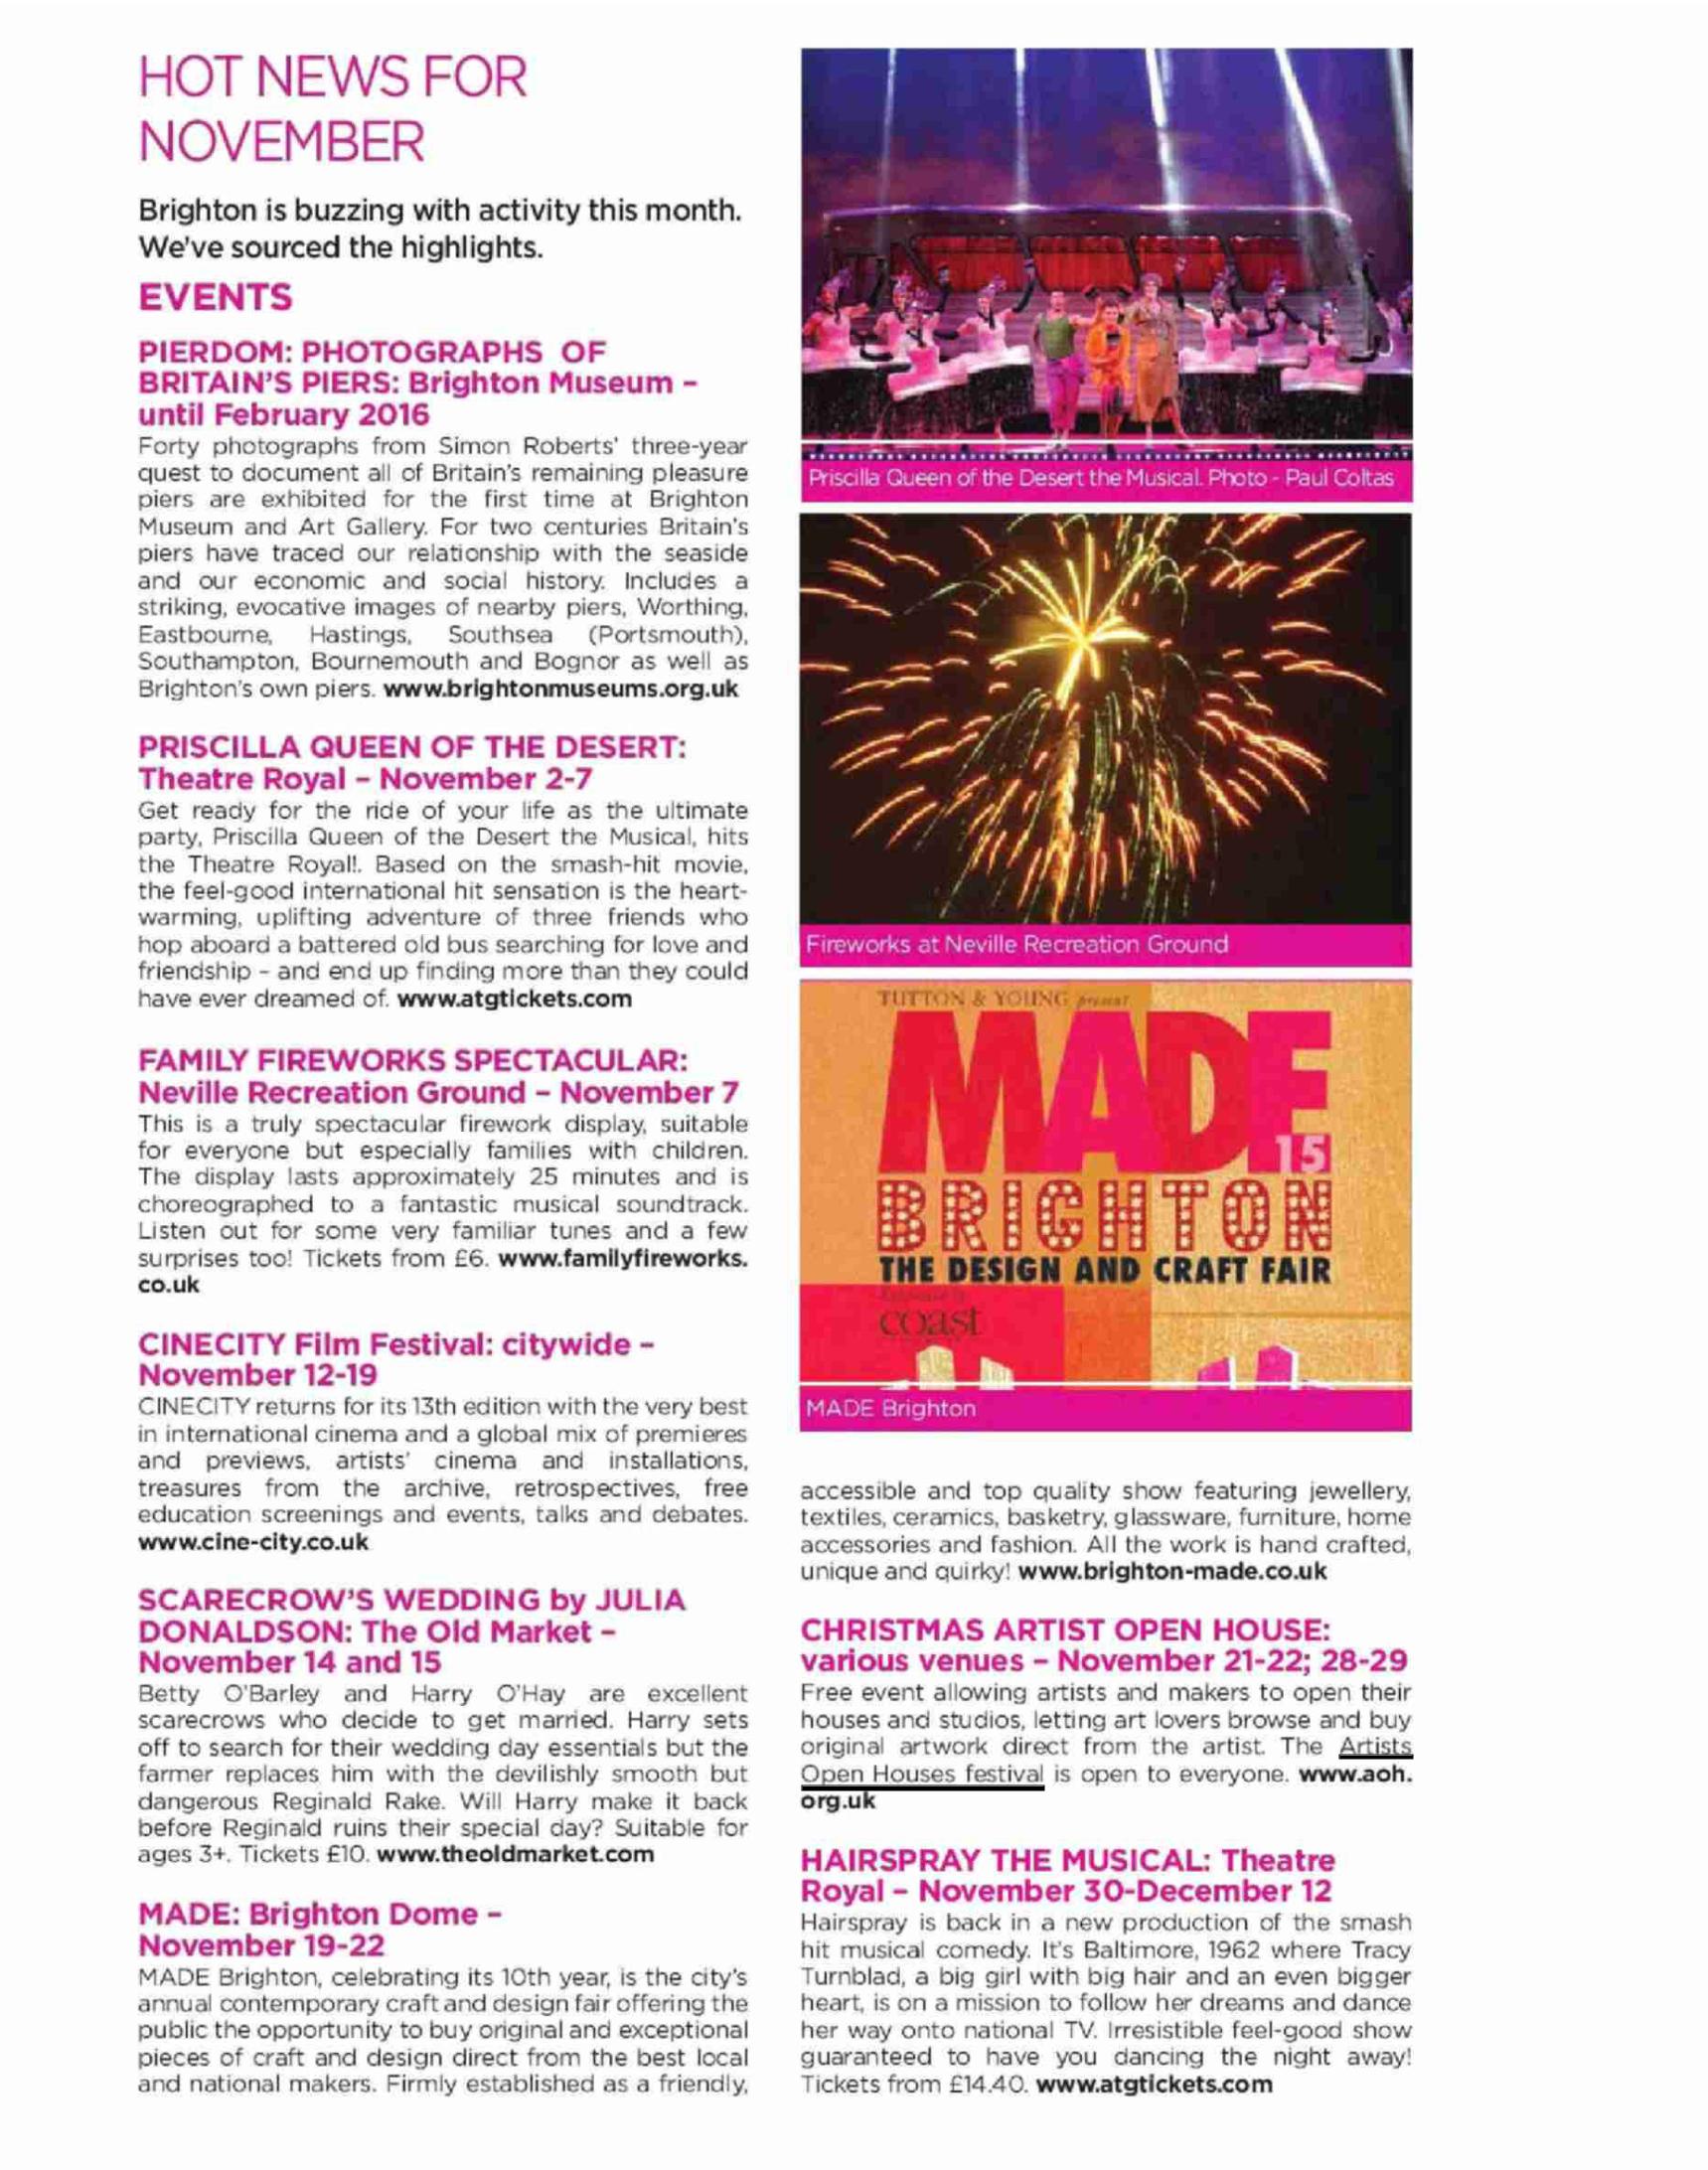 Hot News For November - London Visitors Magazine   Artists Open Houses